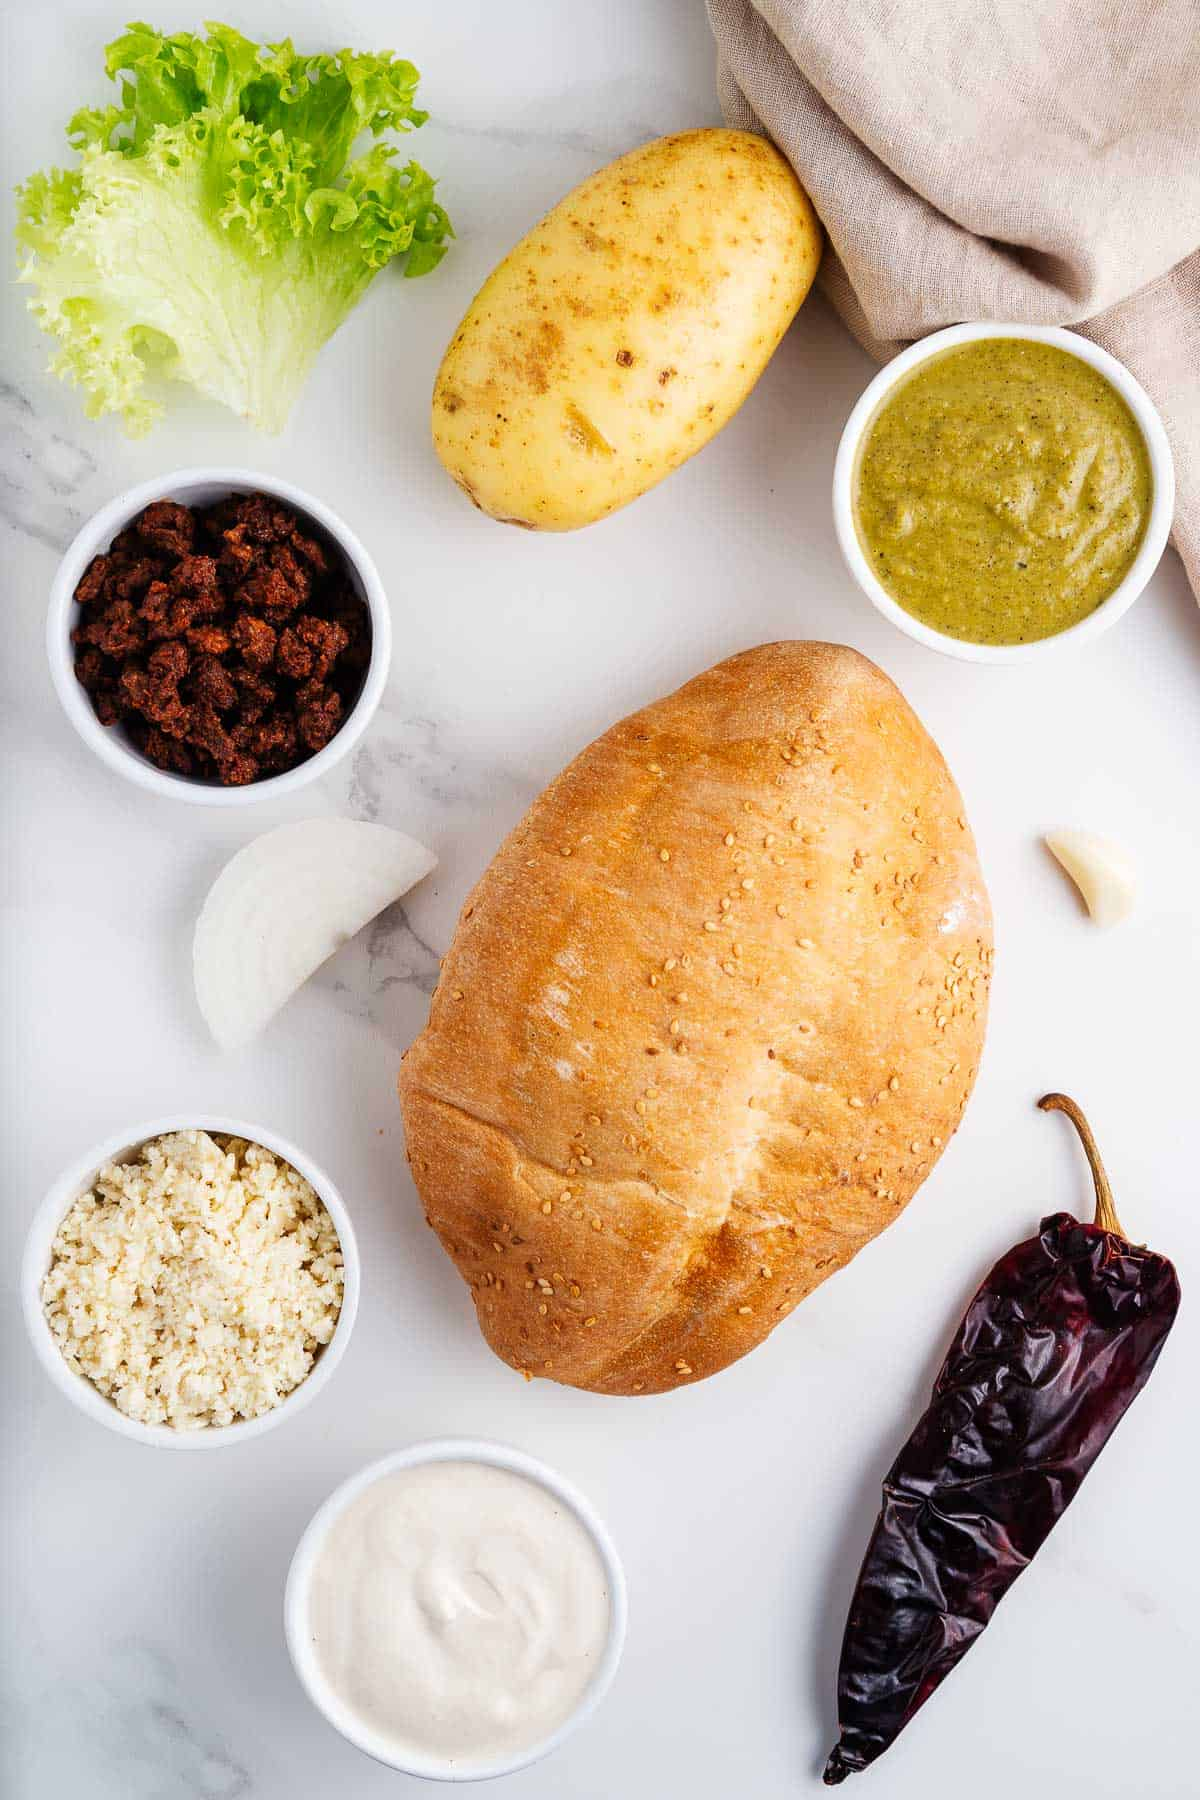 Bun, Potato, Lettuce, Chile, Cotija, Crema, Onion, Garlic, Salsa Verde, and Vegan Chorizo